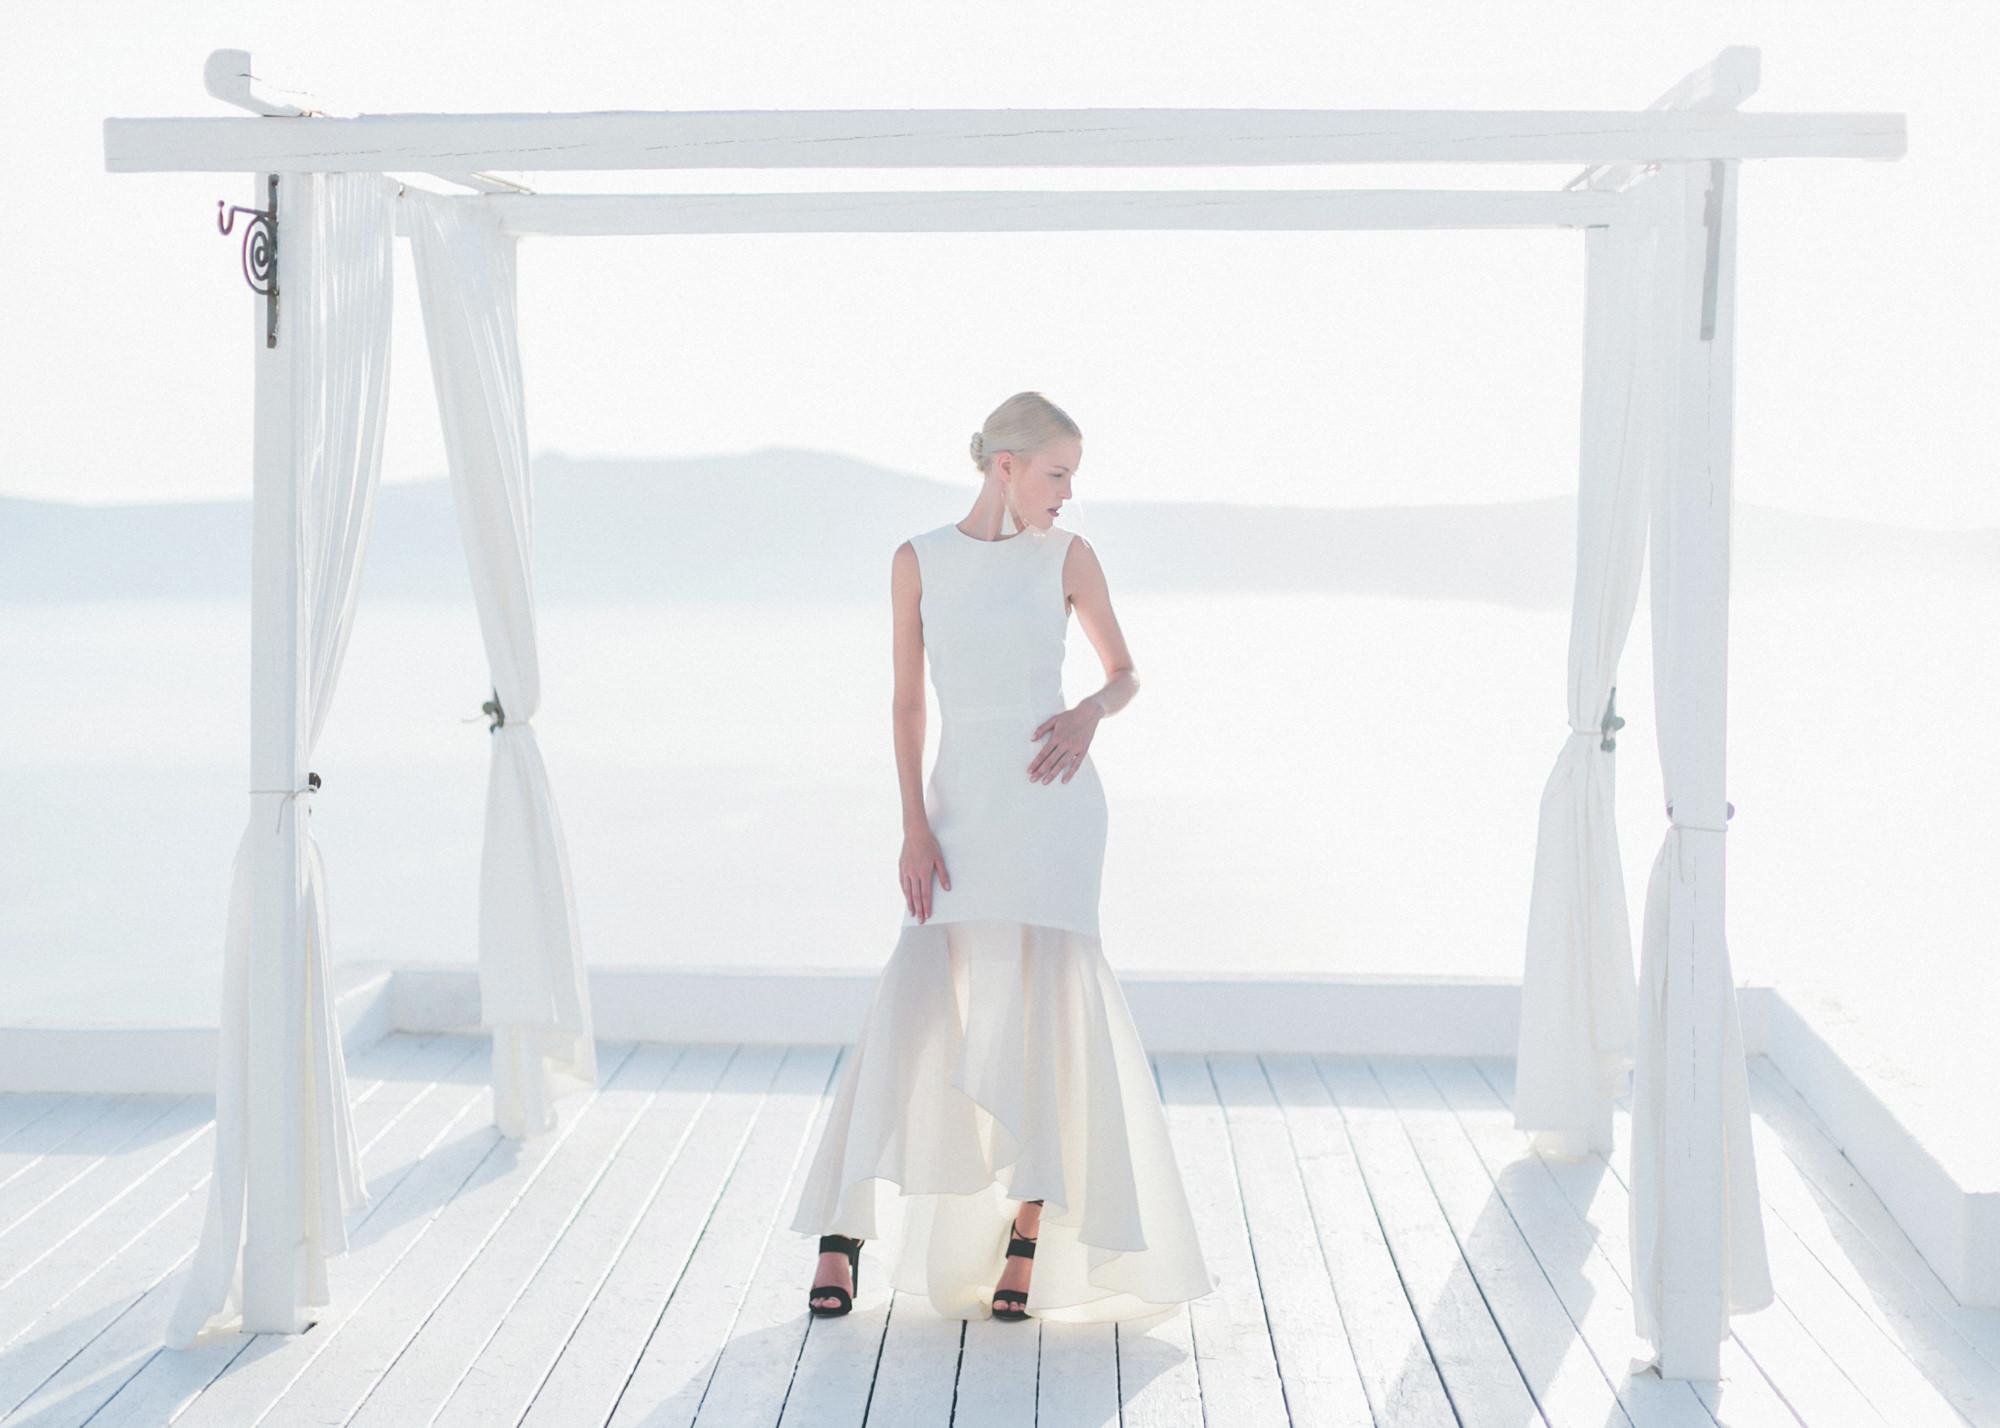 35-portrait-santorini-wedding-photographer-greece-b-v